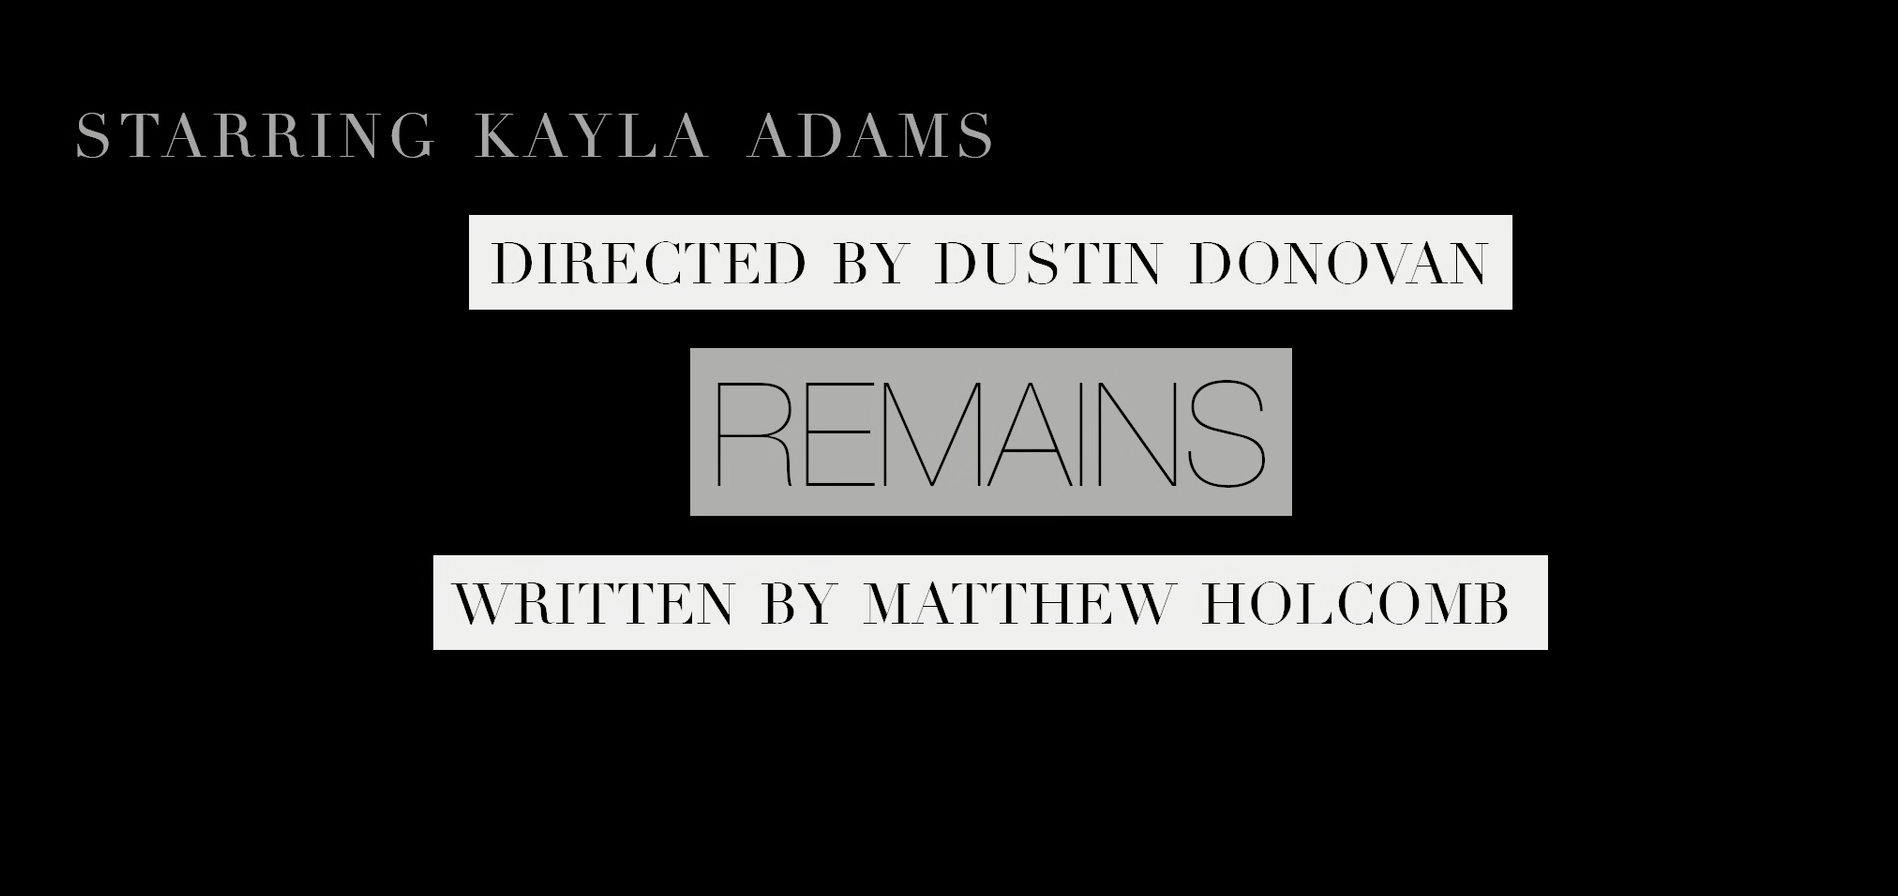 Remains_KaylaAdams